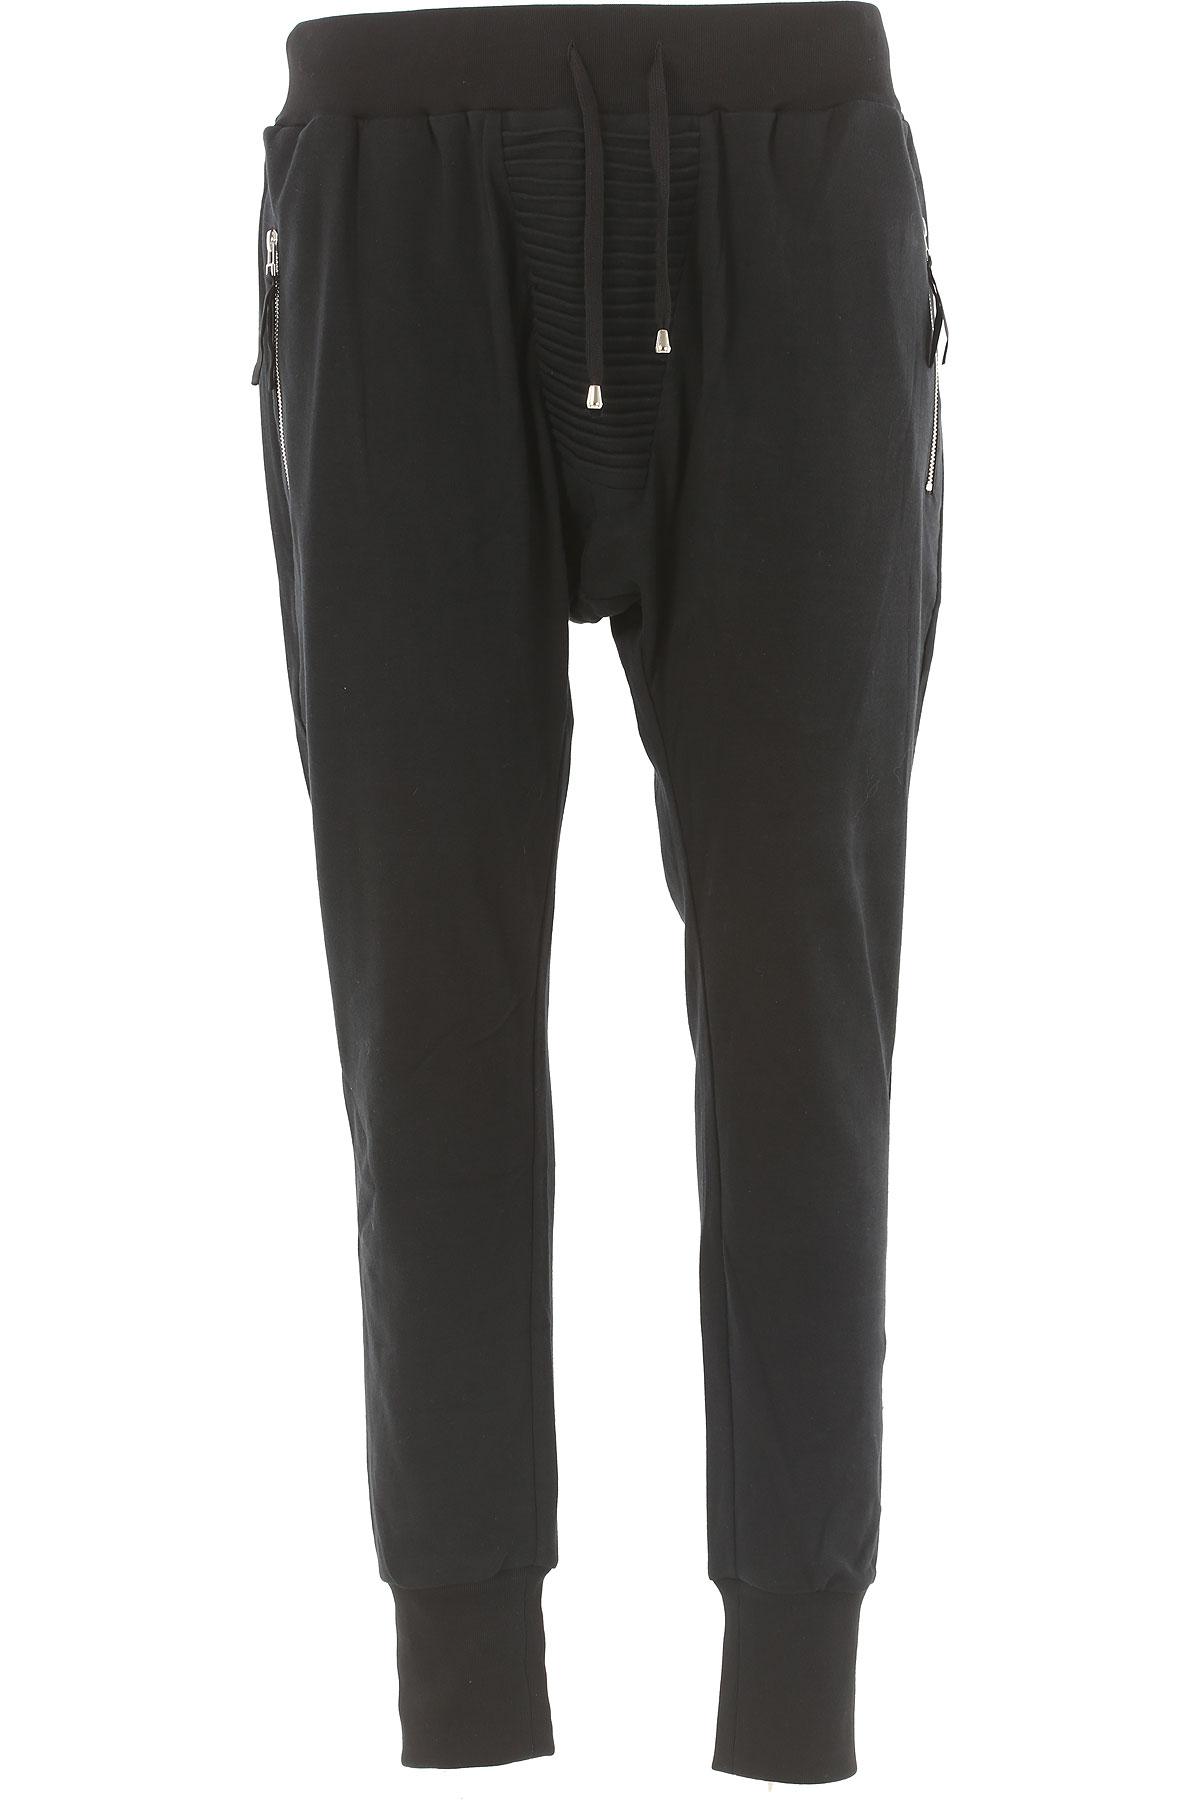 Image of Unconditional Mens Clothing On Sale, Black, Cotton, 2017, L M S XL